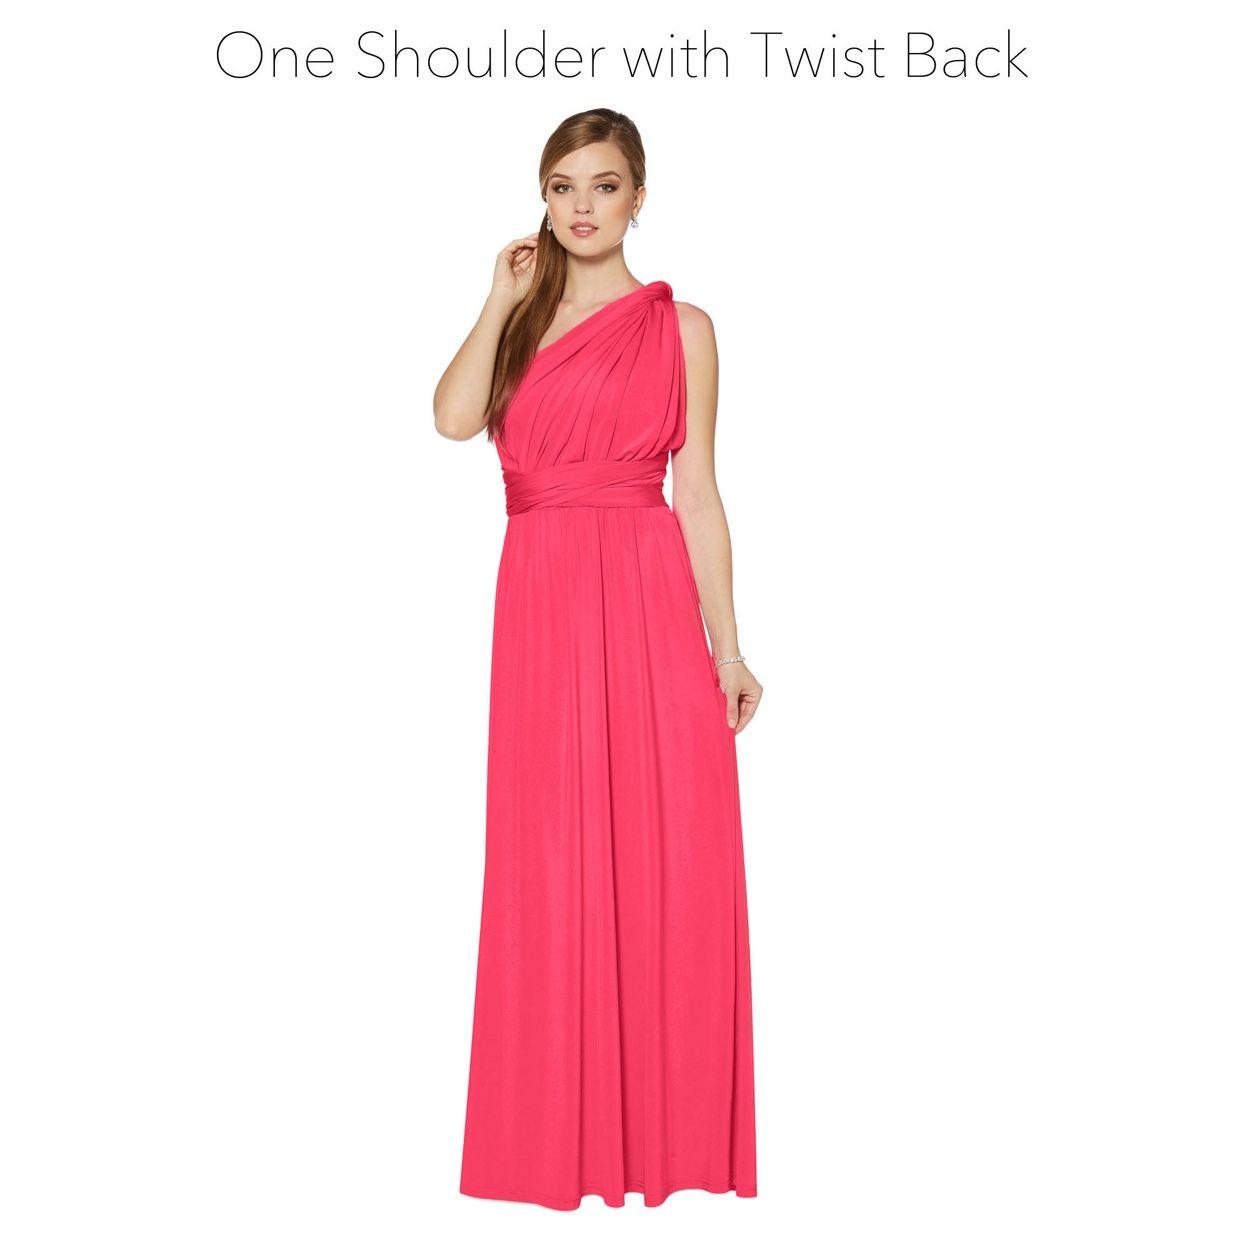 Debut Pink Pleated Multiway Maxi Dress- At Debenhams.com